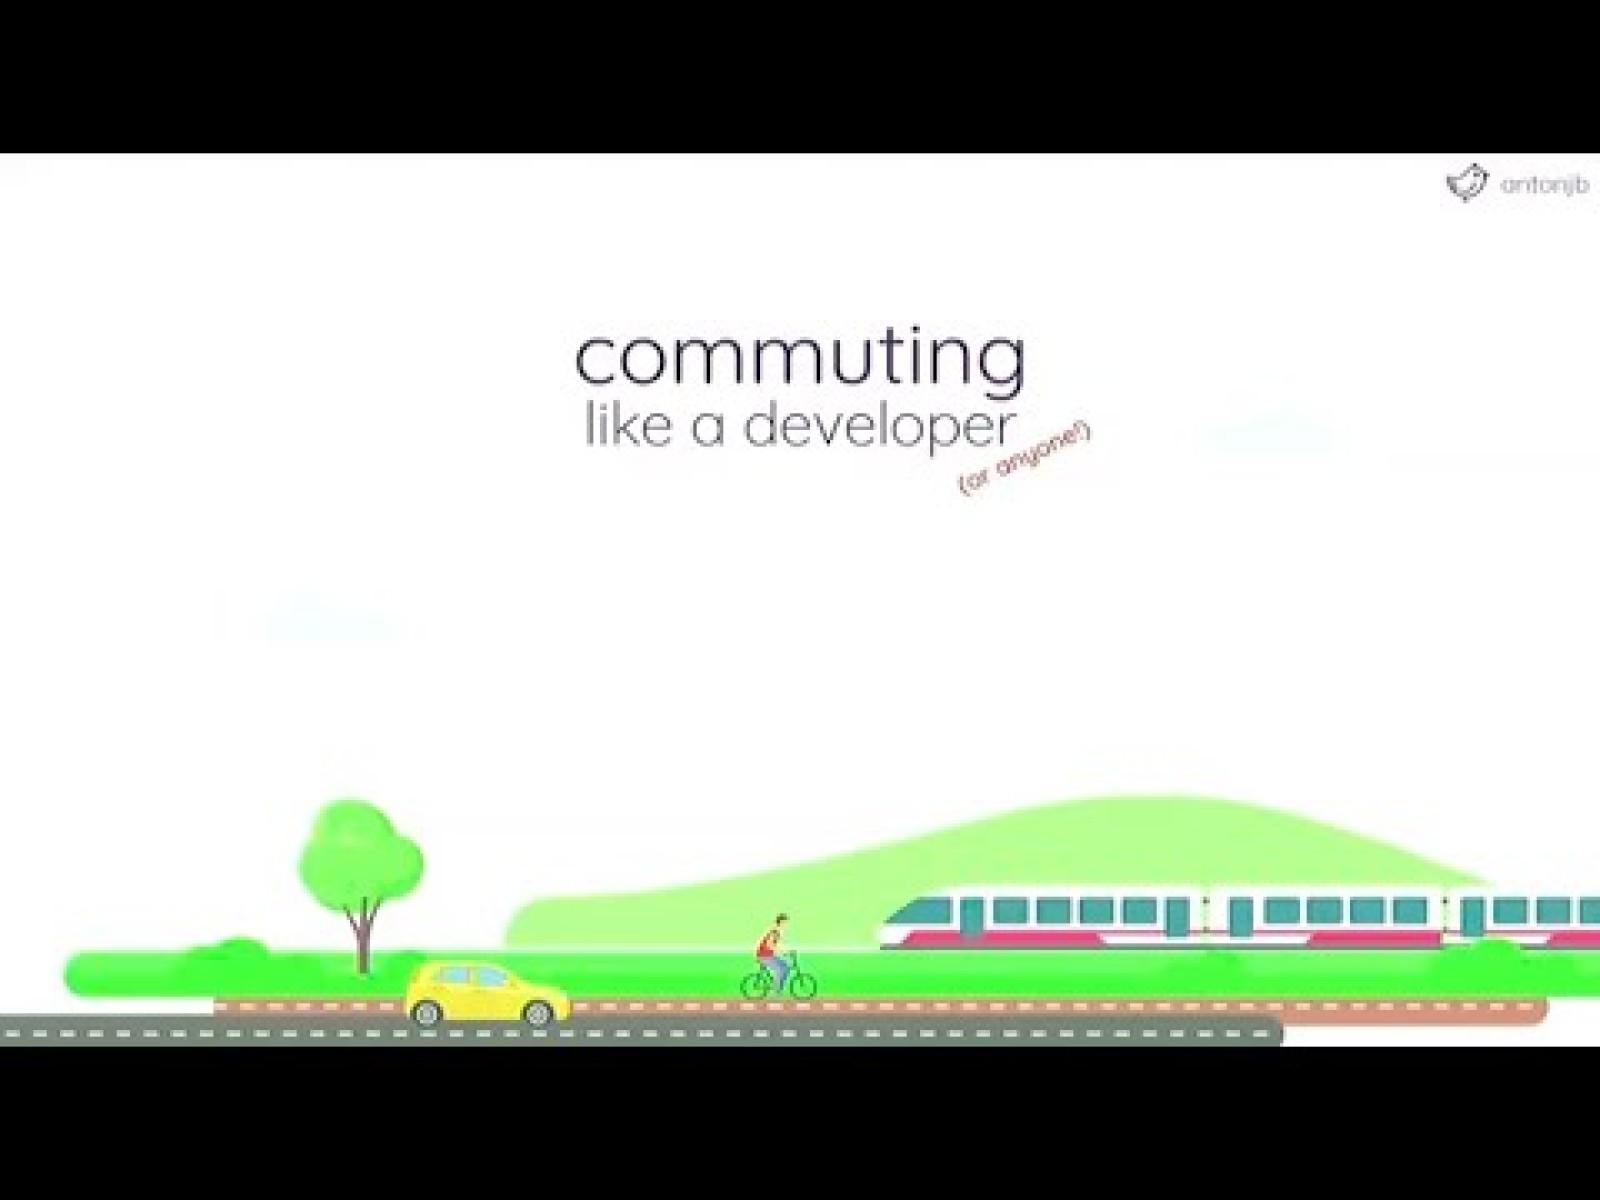 Commuting like a developer